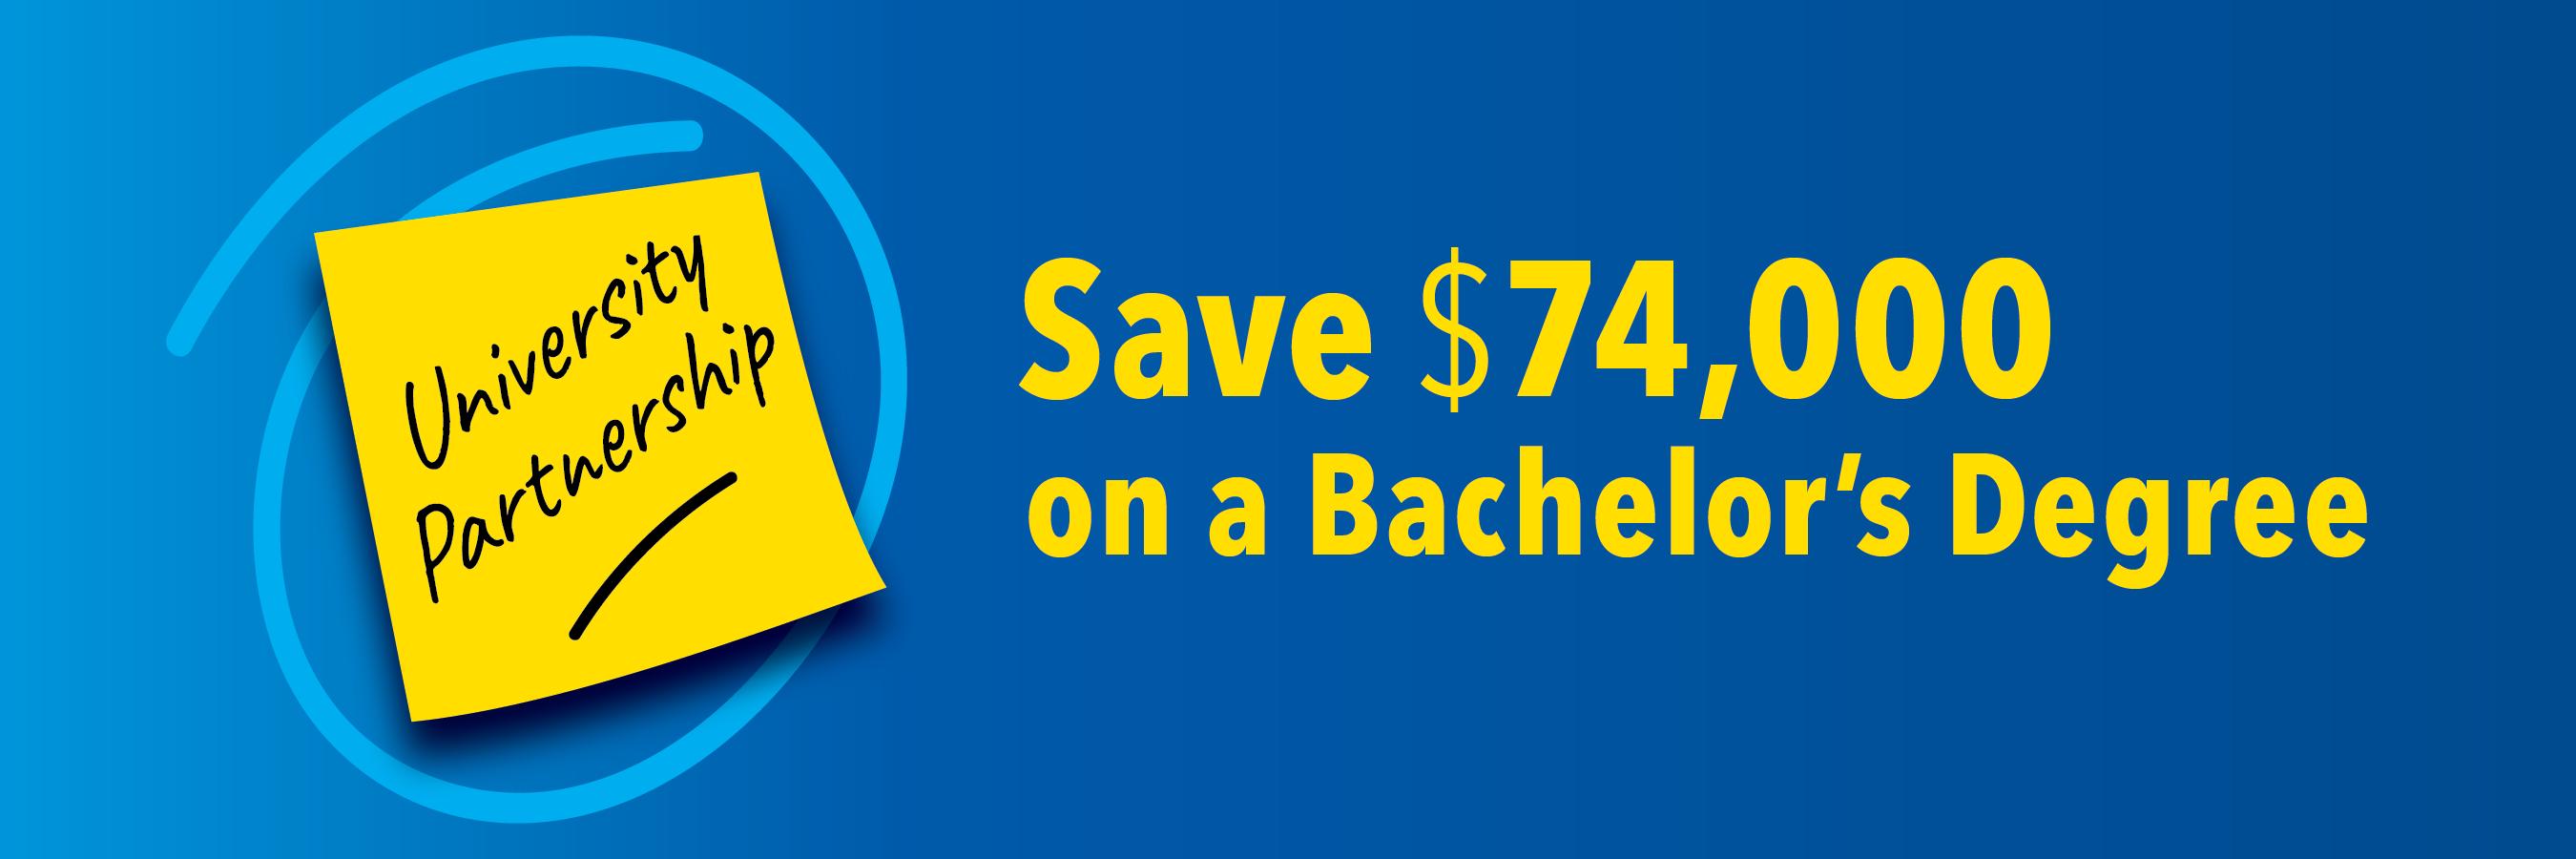 University Partnership. Save $74,000 on a bachelor's degree.